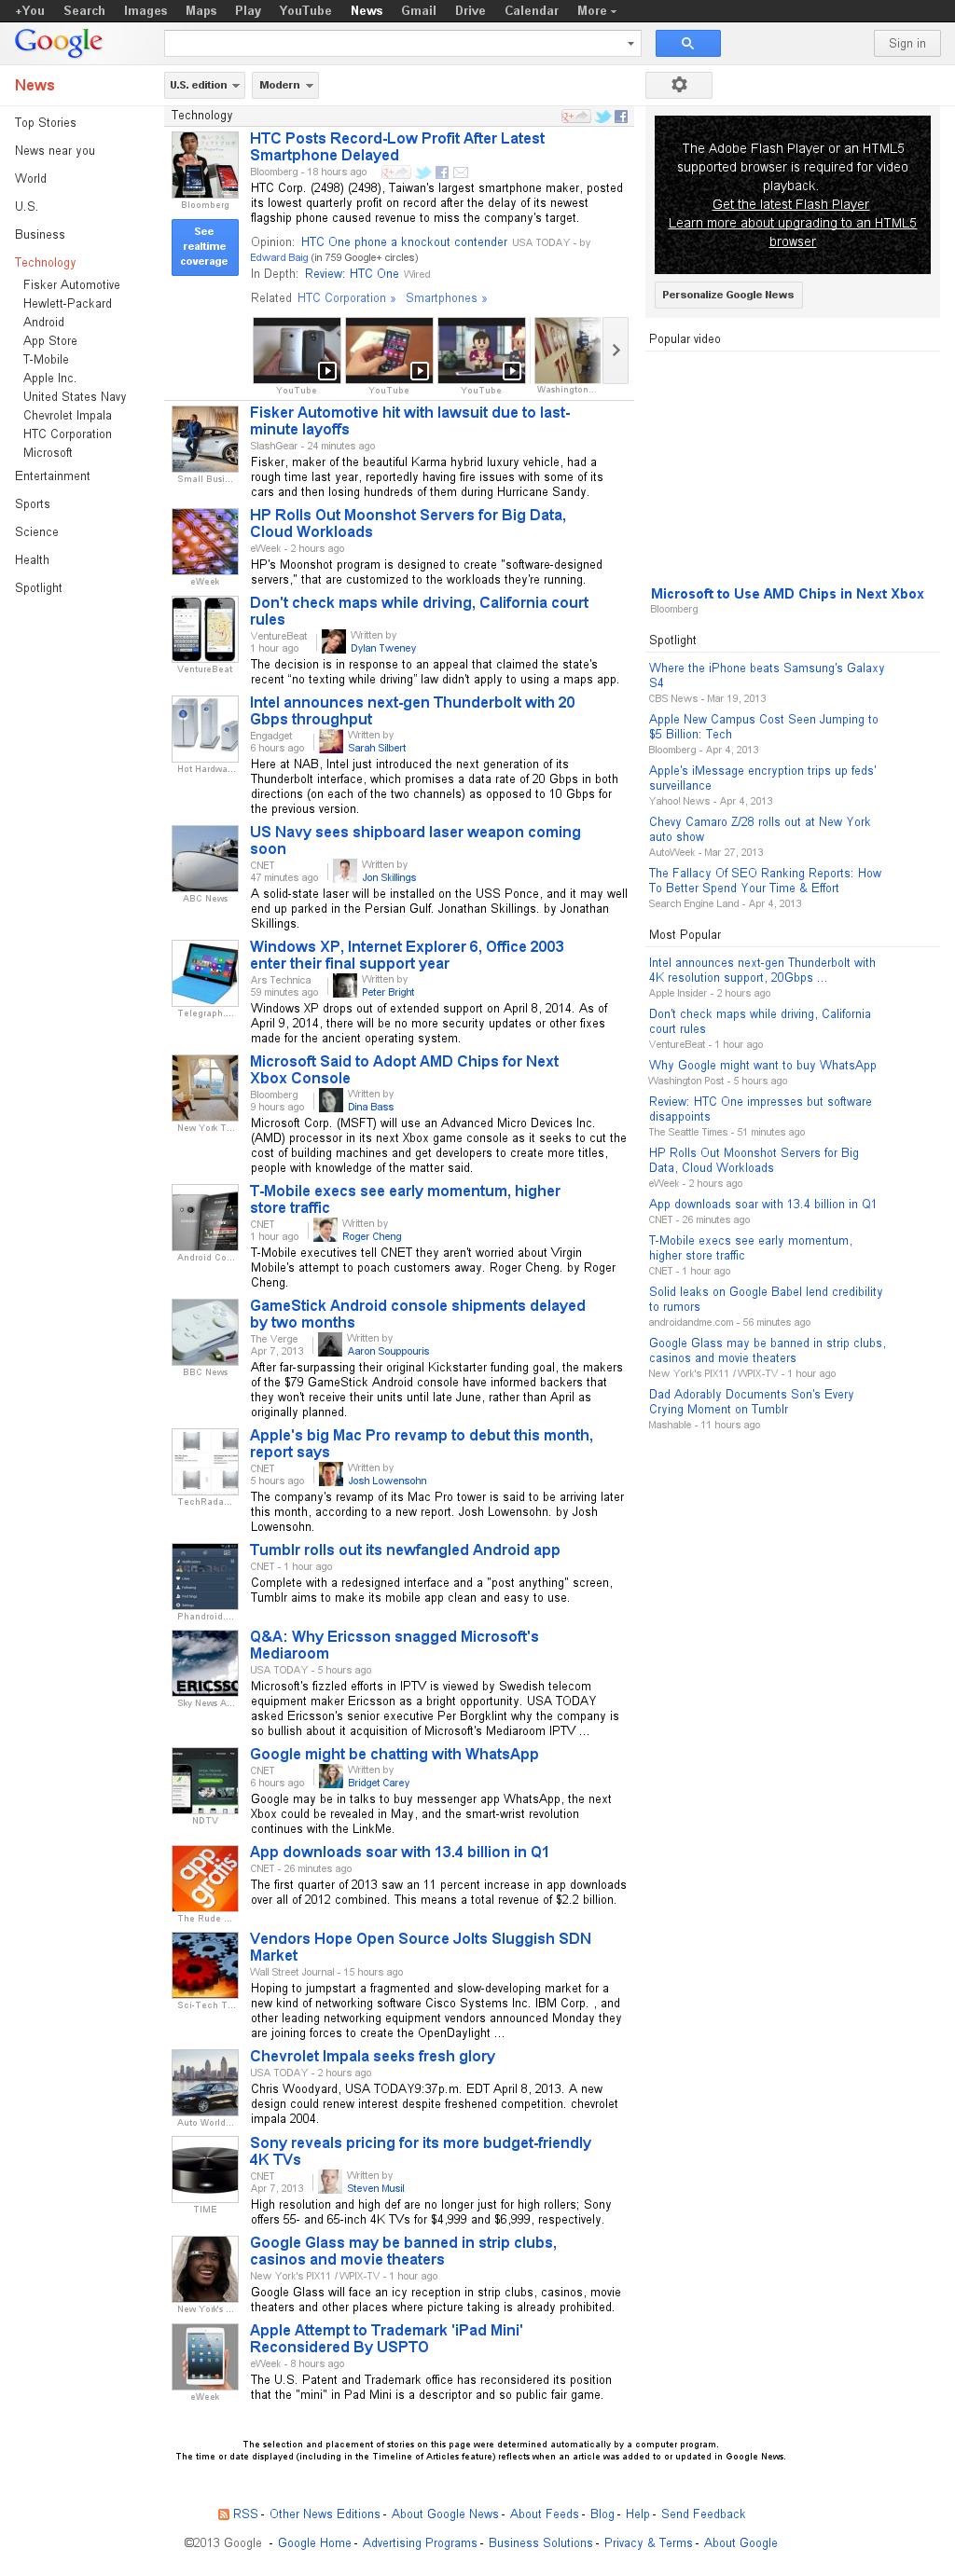 Google News: Technology at Tuesday April 9, 2013, 2:08 a.m. UTC